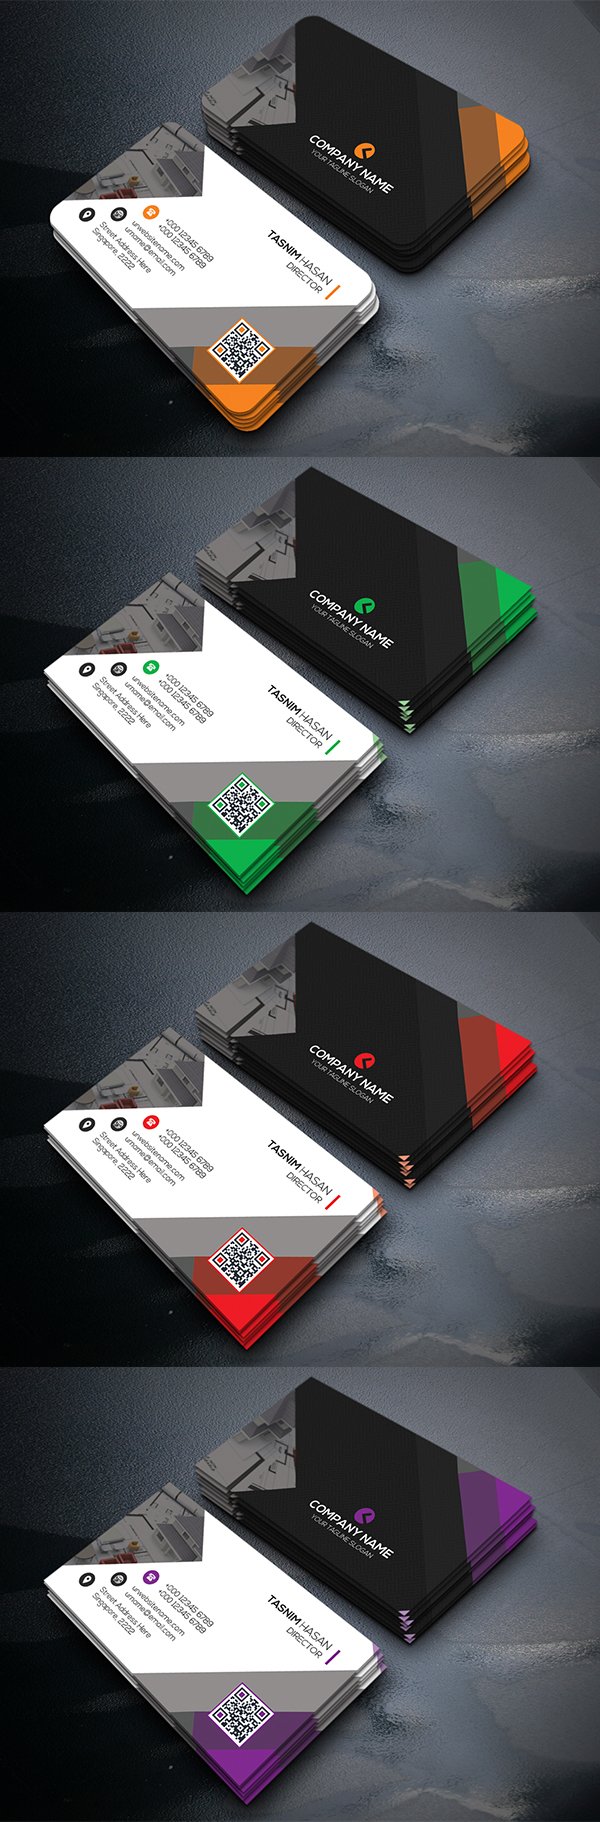 20 Business Card Design